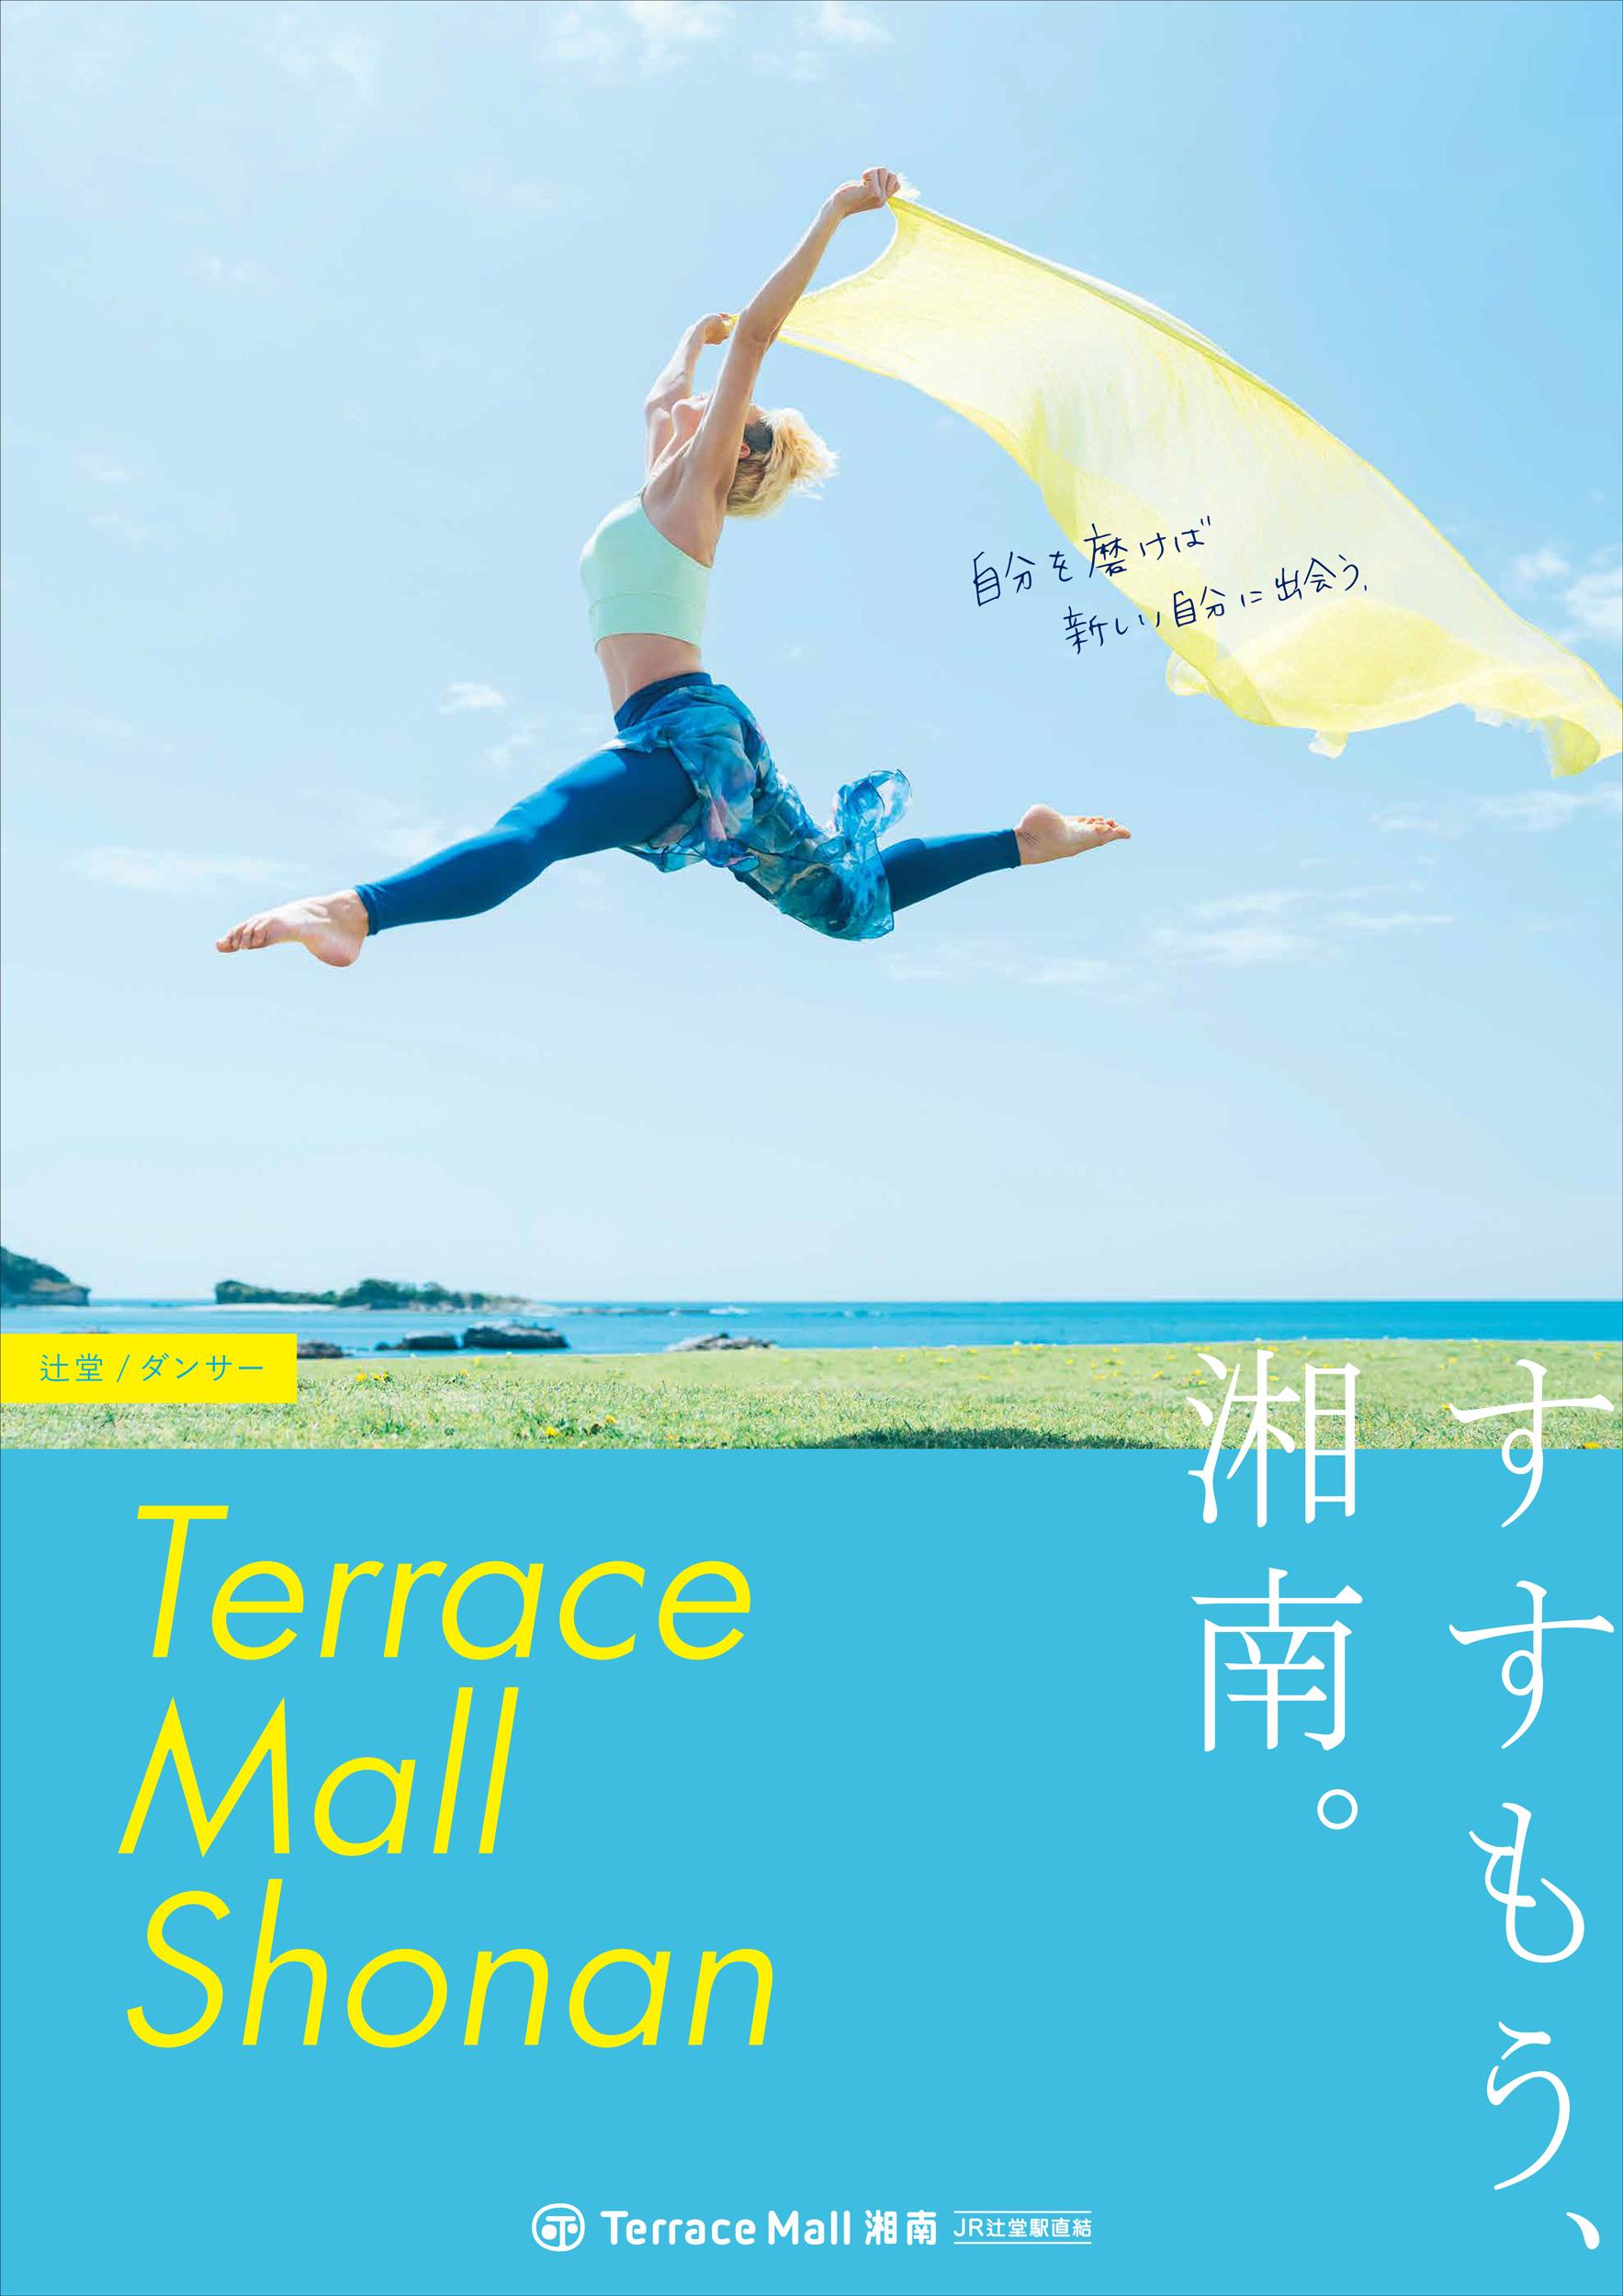 TerraceMallShounan_summer_b1.jpg